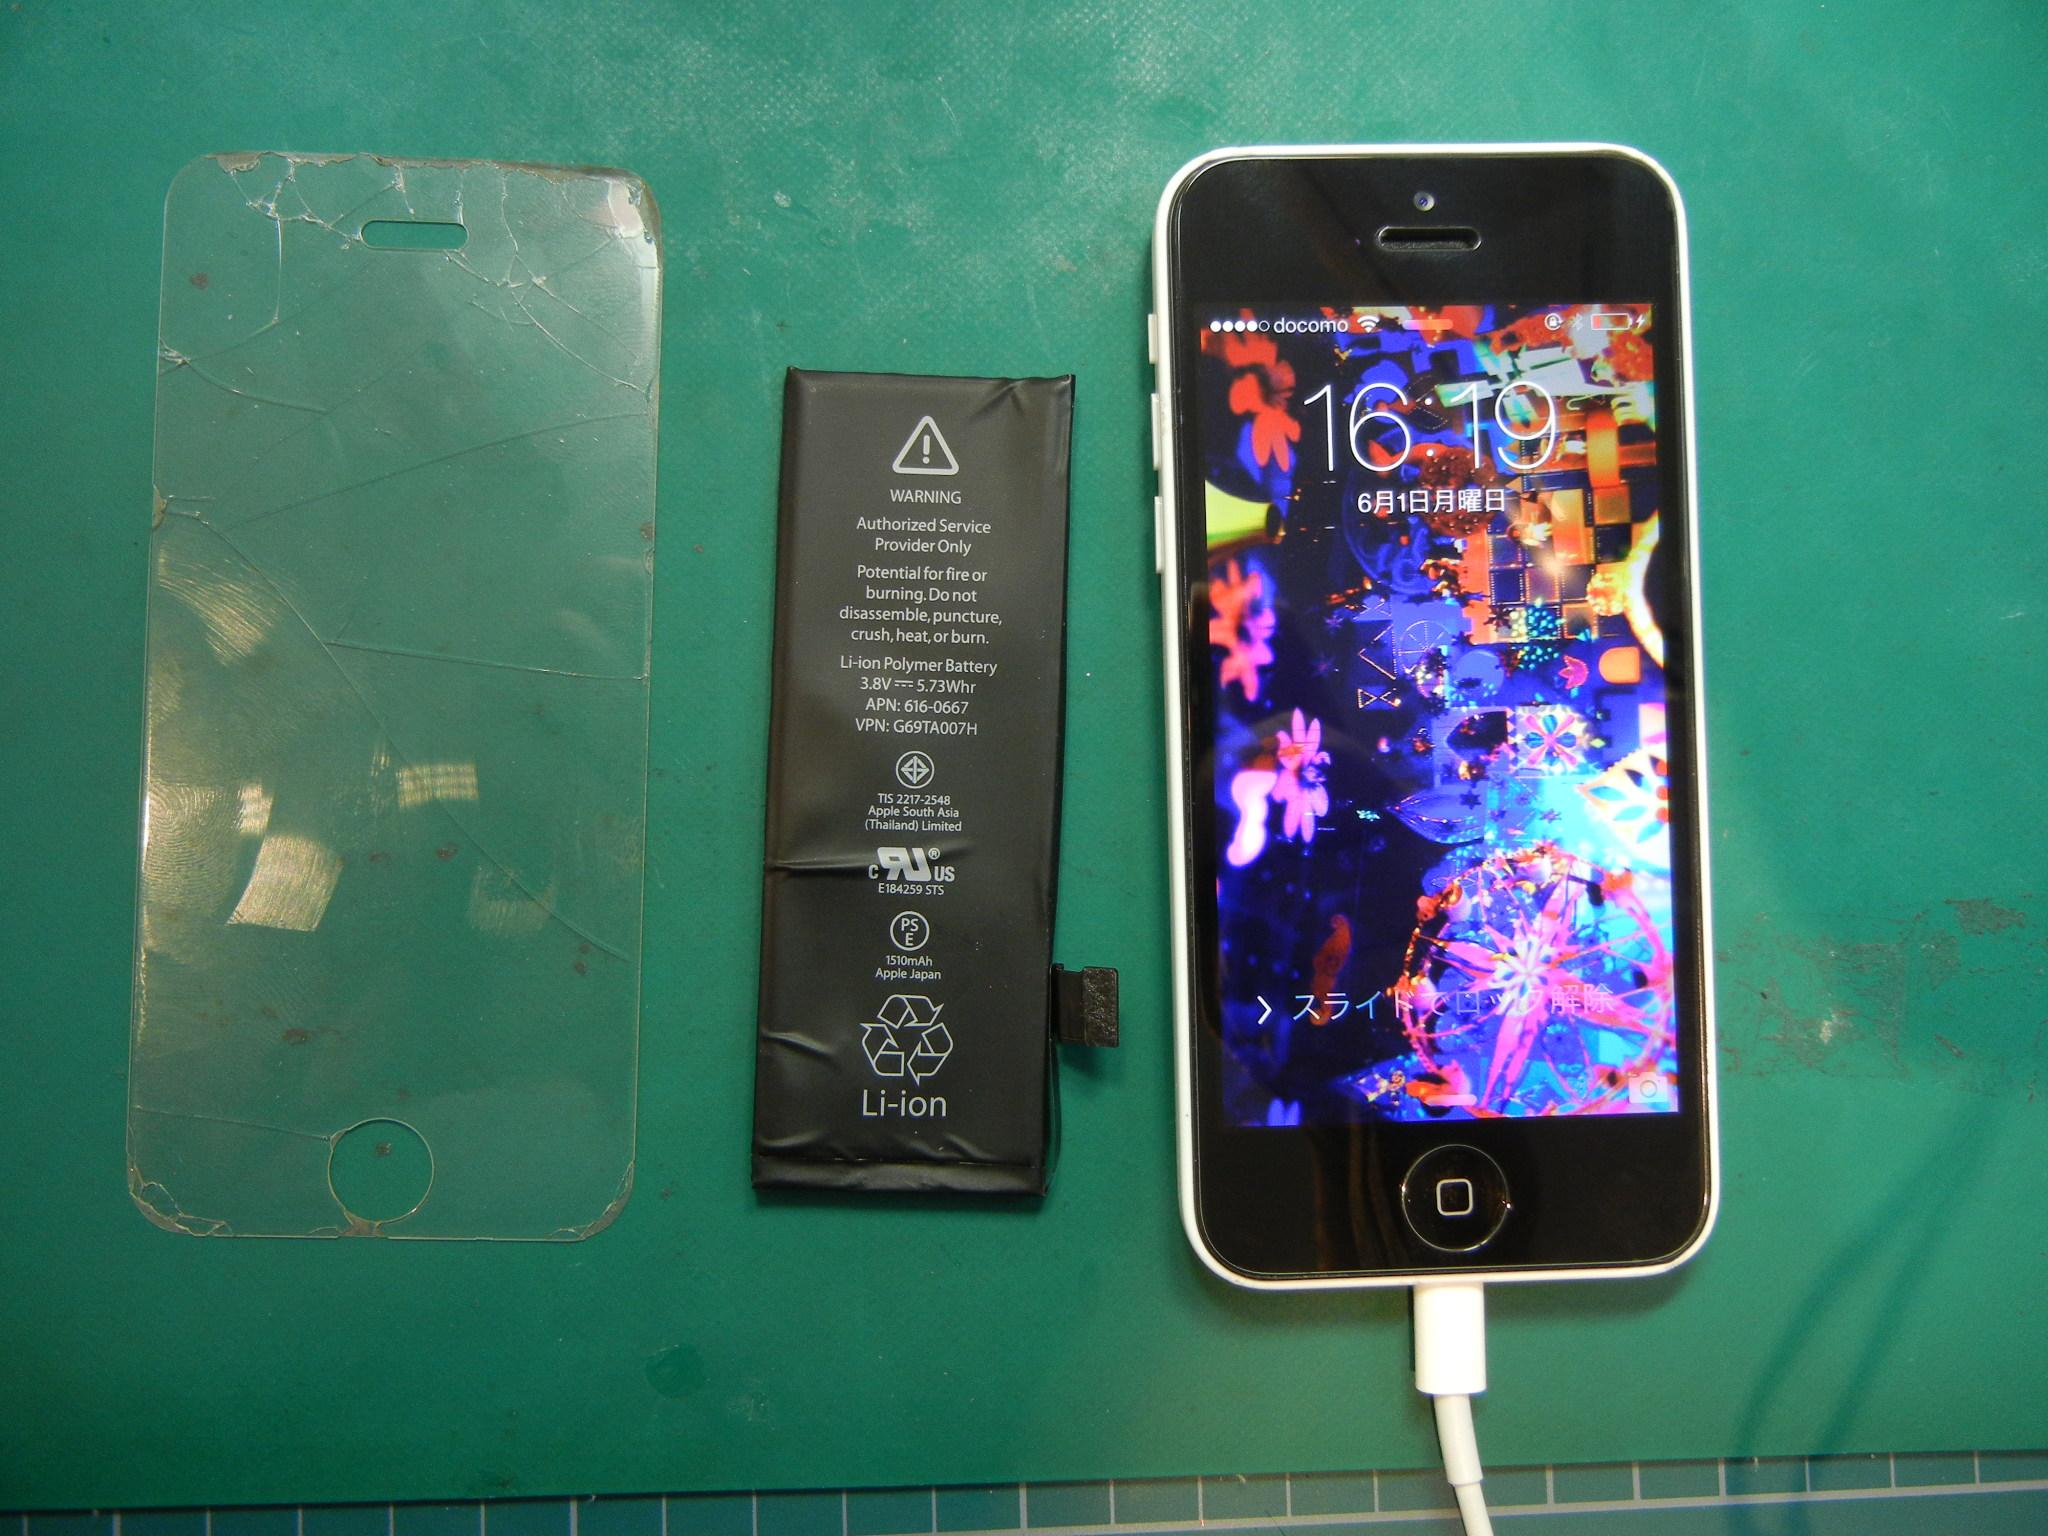 iPhone5Cバッテリー交換修理はiFC埼玉戸田店0628